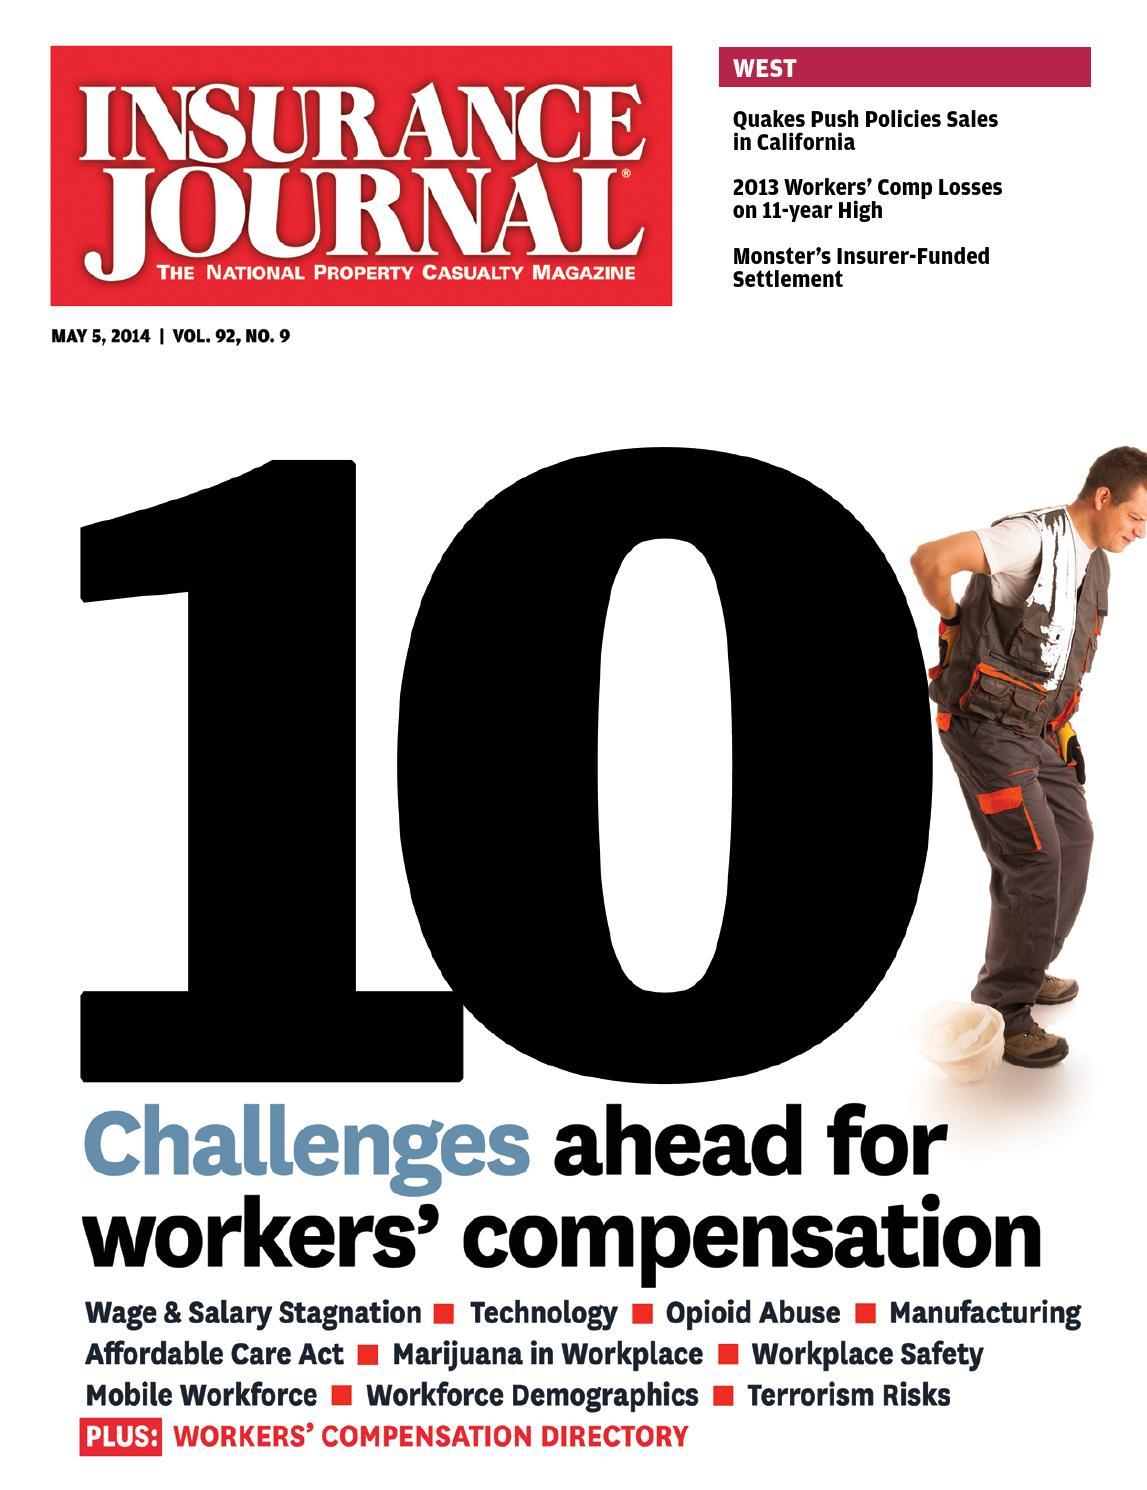 Insurance Journal West 2014-05-05 by Insurance Journal - issuu